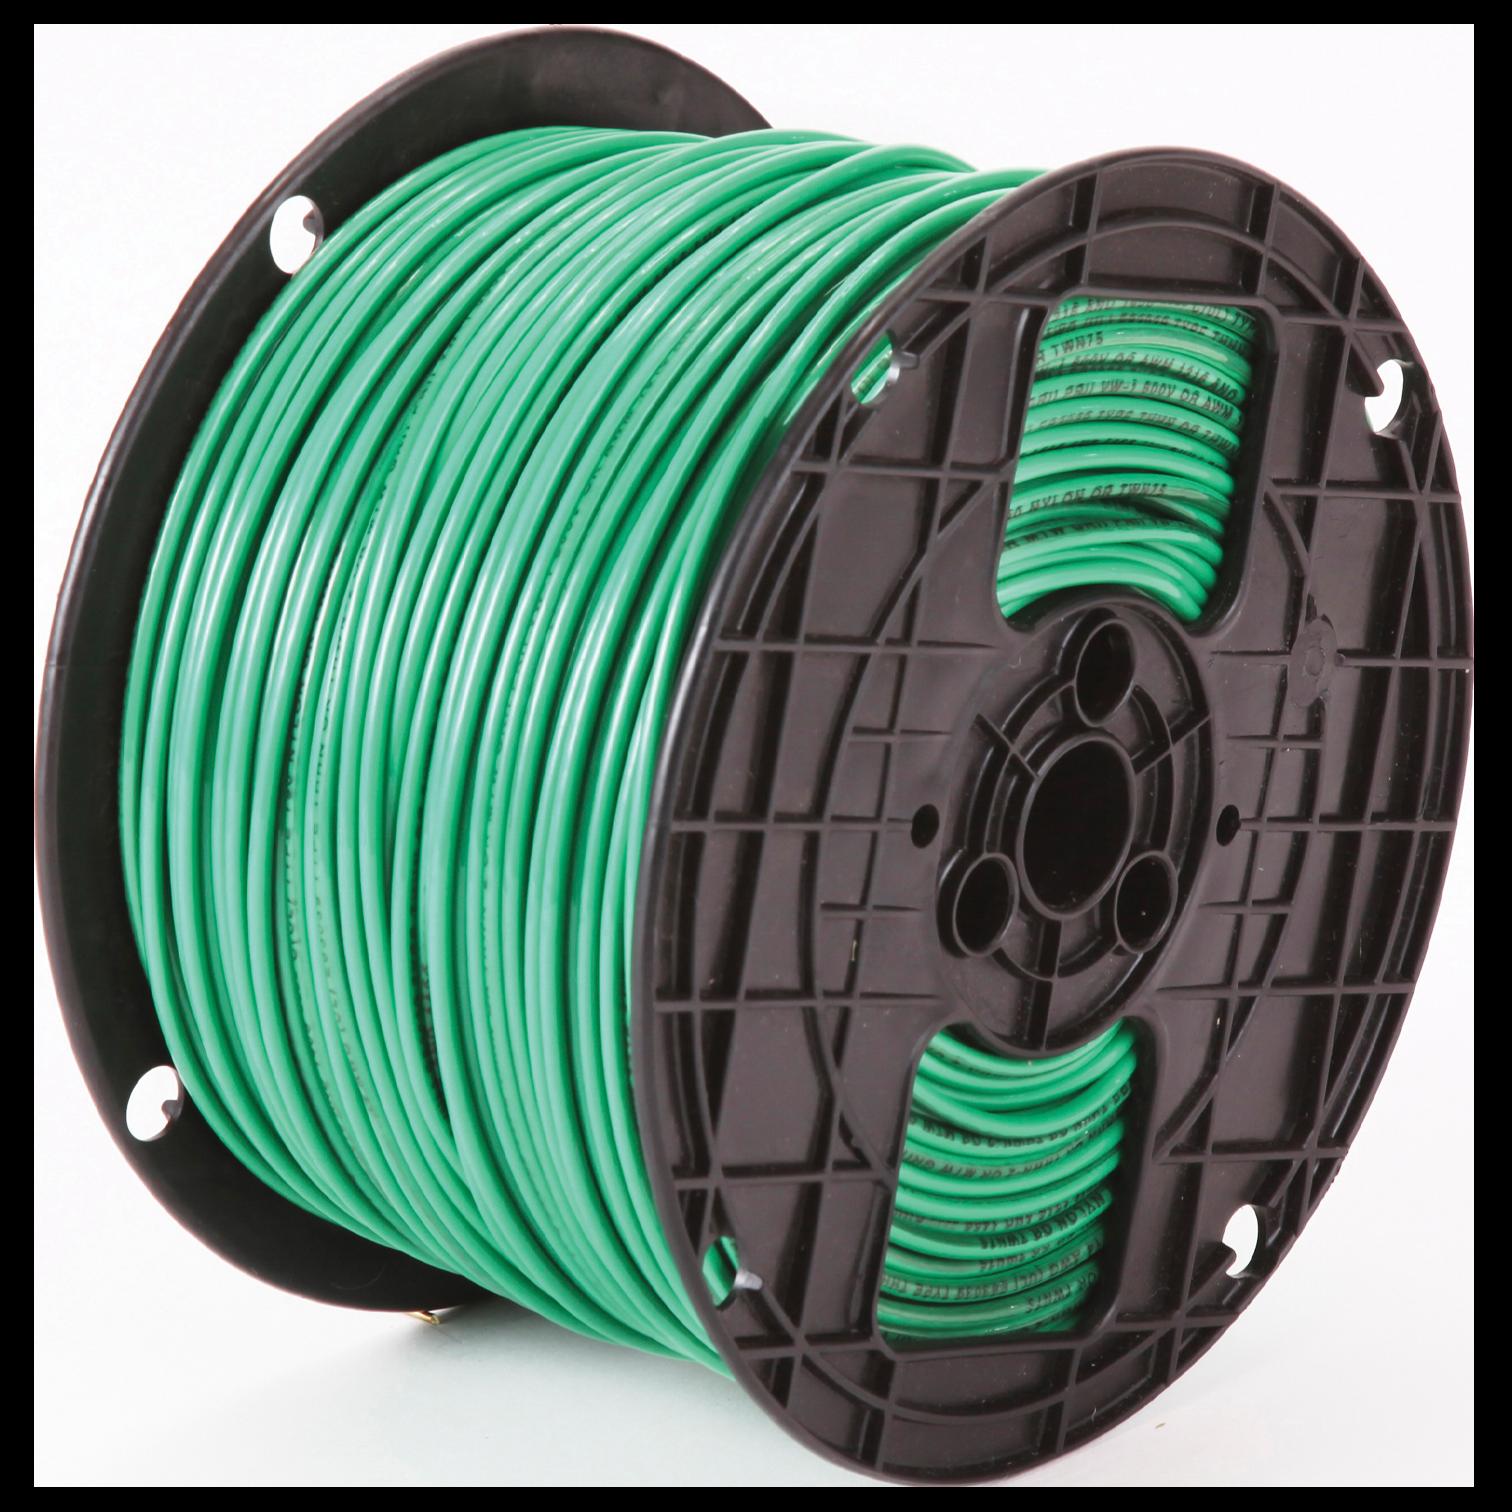 THHN 12 STR GREEN 500/SPL